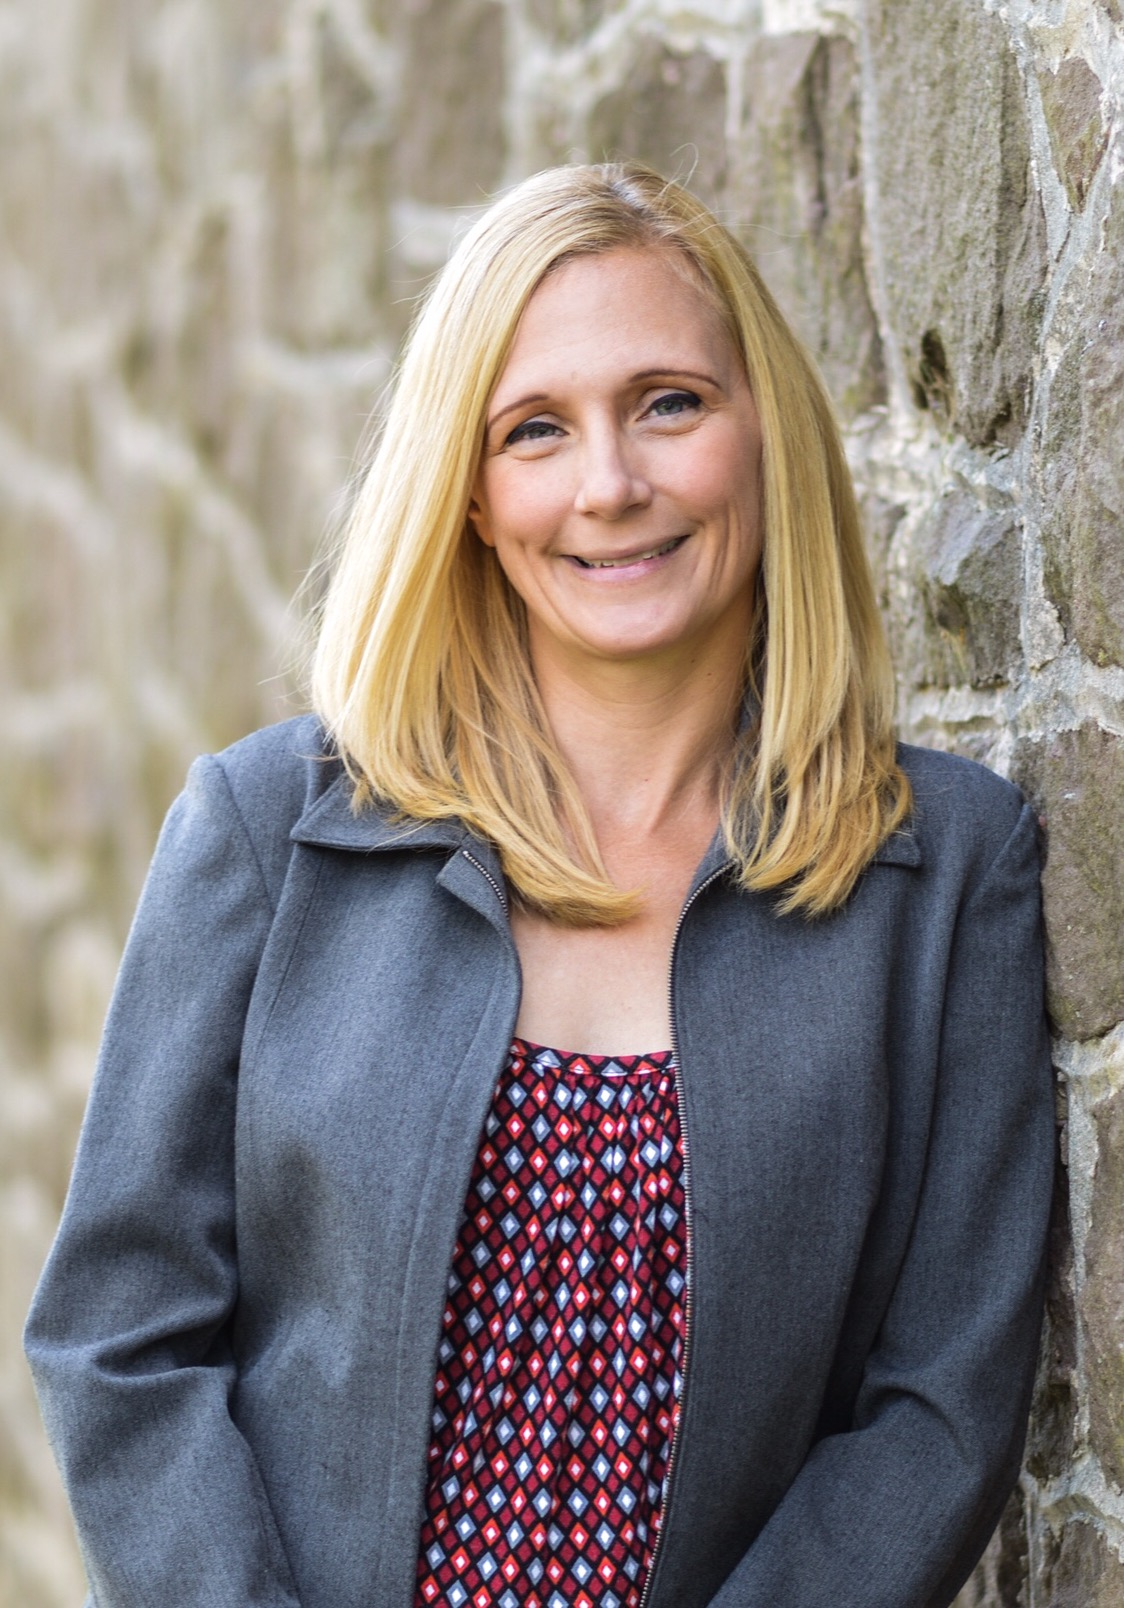 Stephanie Loscig